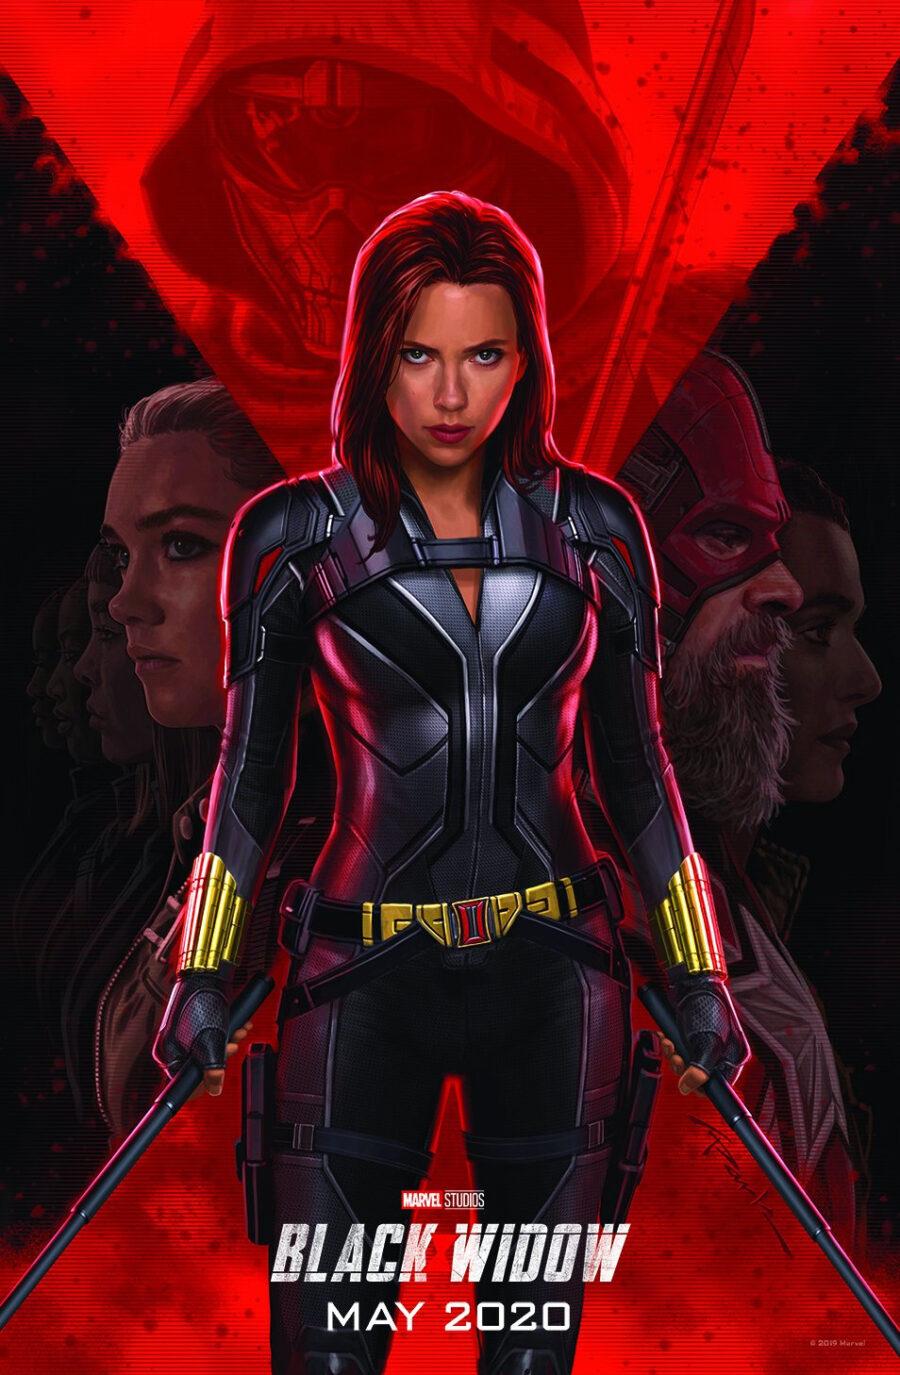 Black Widow's superhero movie solo poster